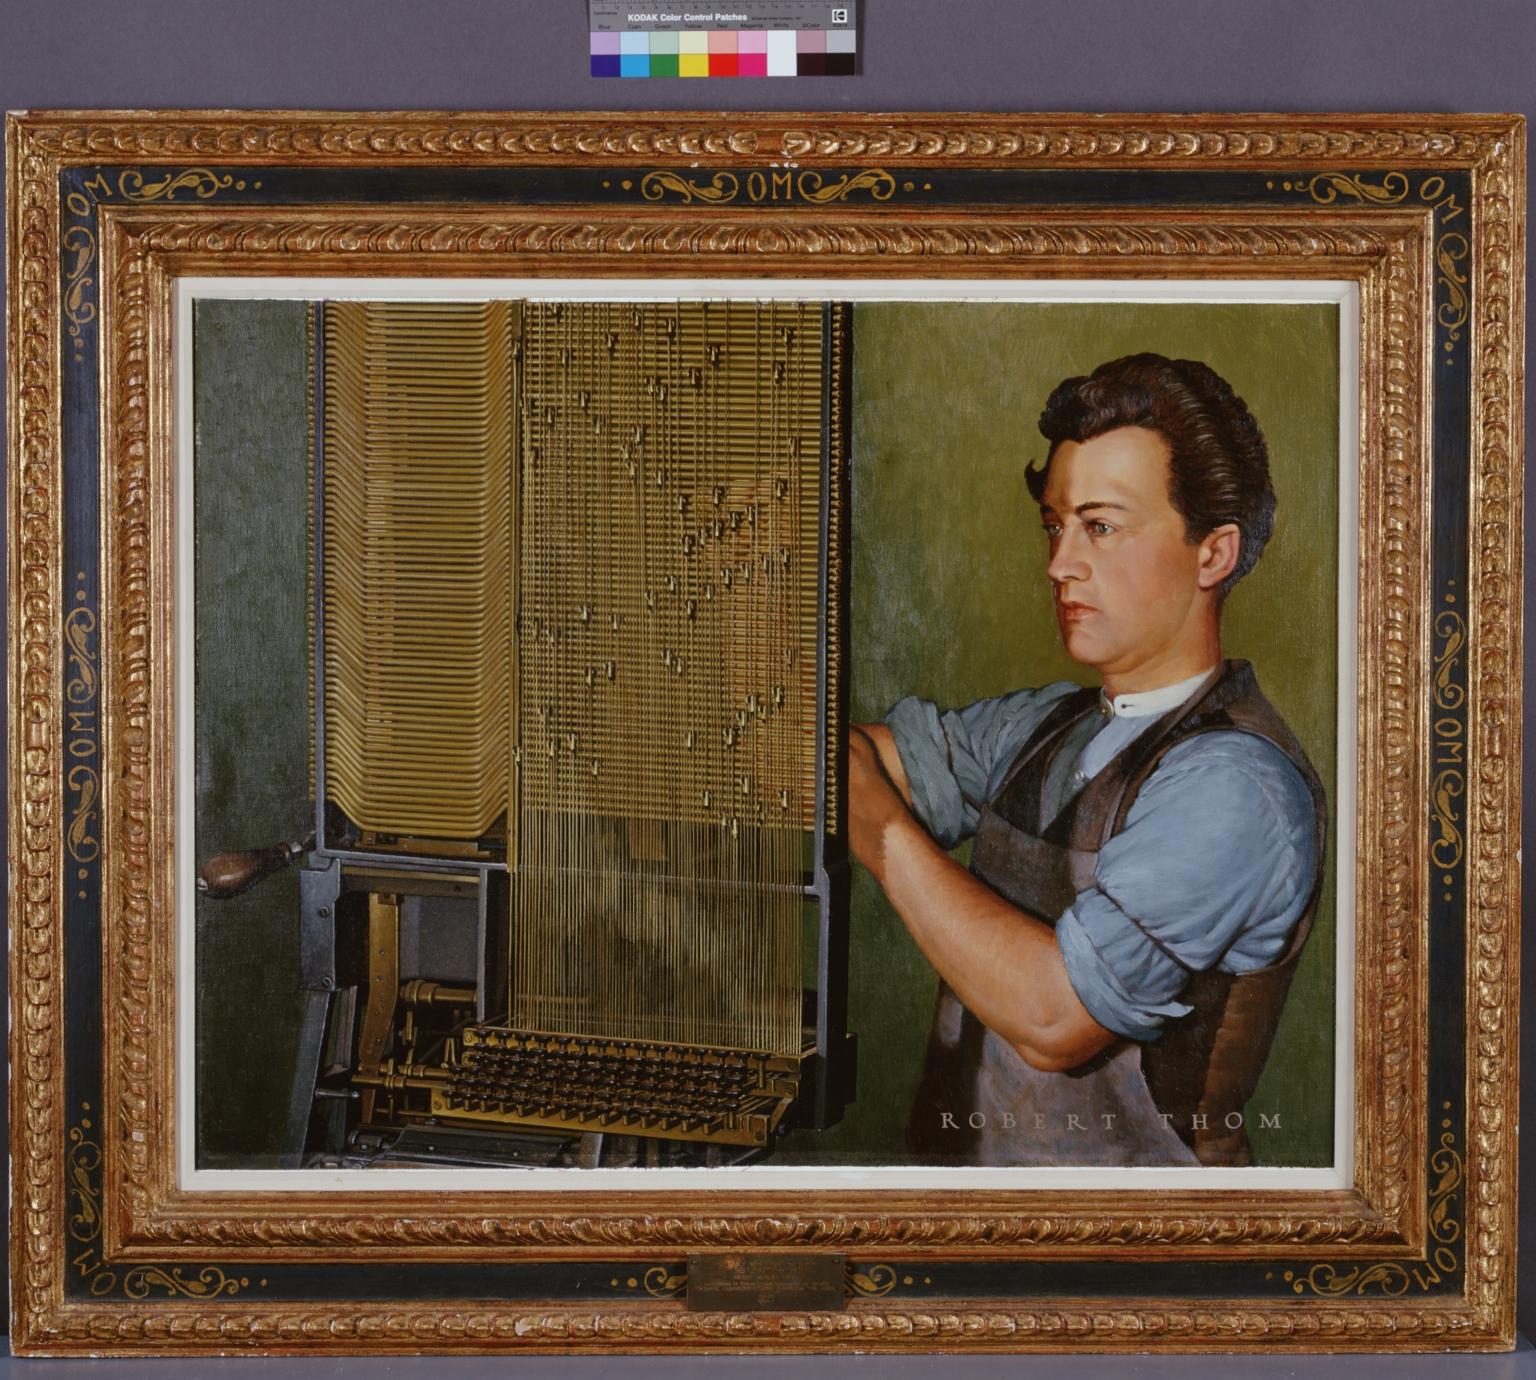 Ottmar Mergenthaler and the Linotype